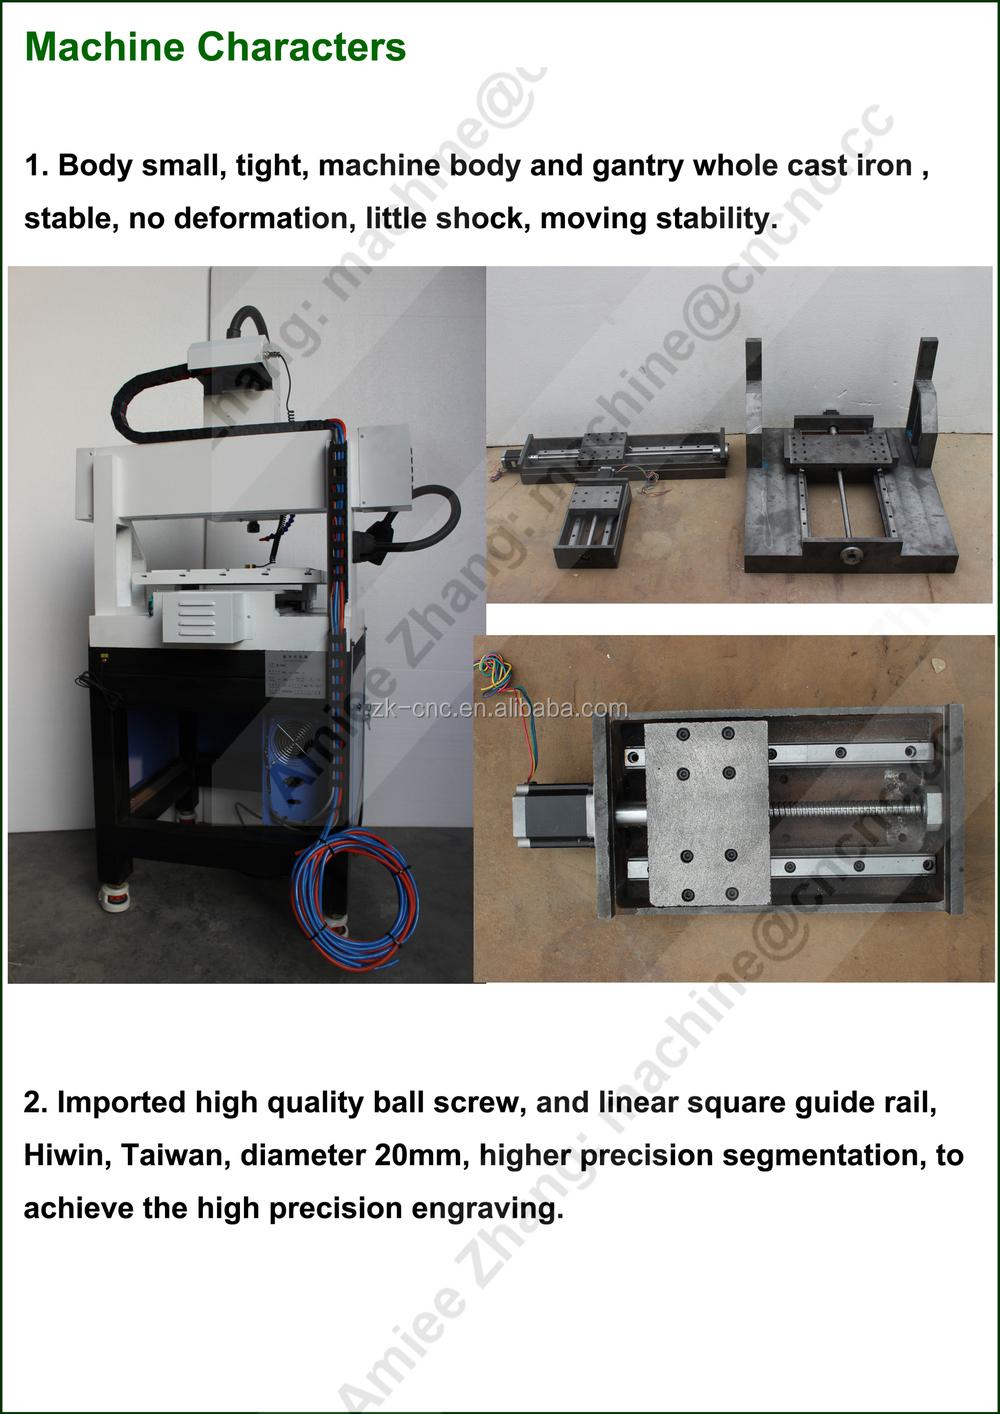 4040 6060 Pcb Cnc Routeur Fraisage Forage Machine Dsp Contrle Circuit Board Processing Machine400400mm Buy Lead Cutting Ajuster Spindel Vitesse La